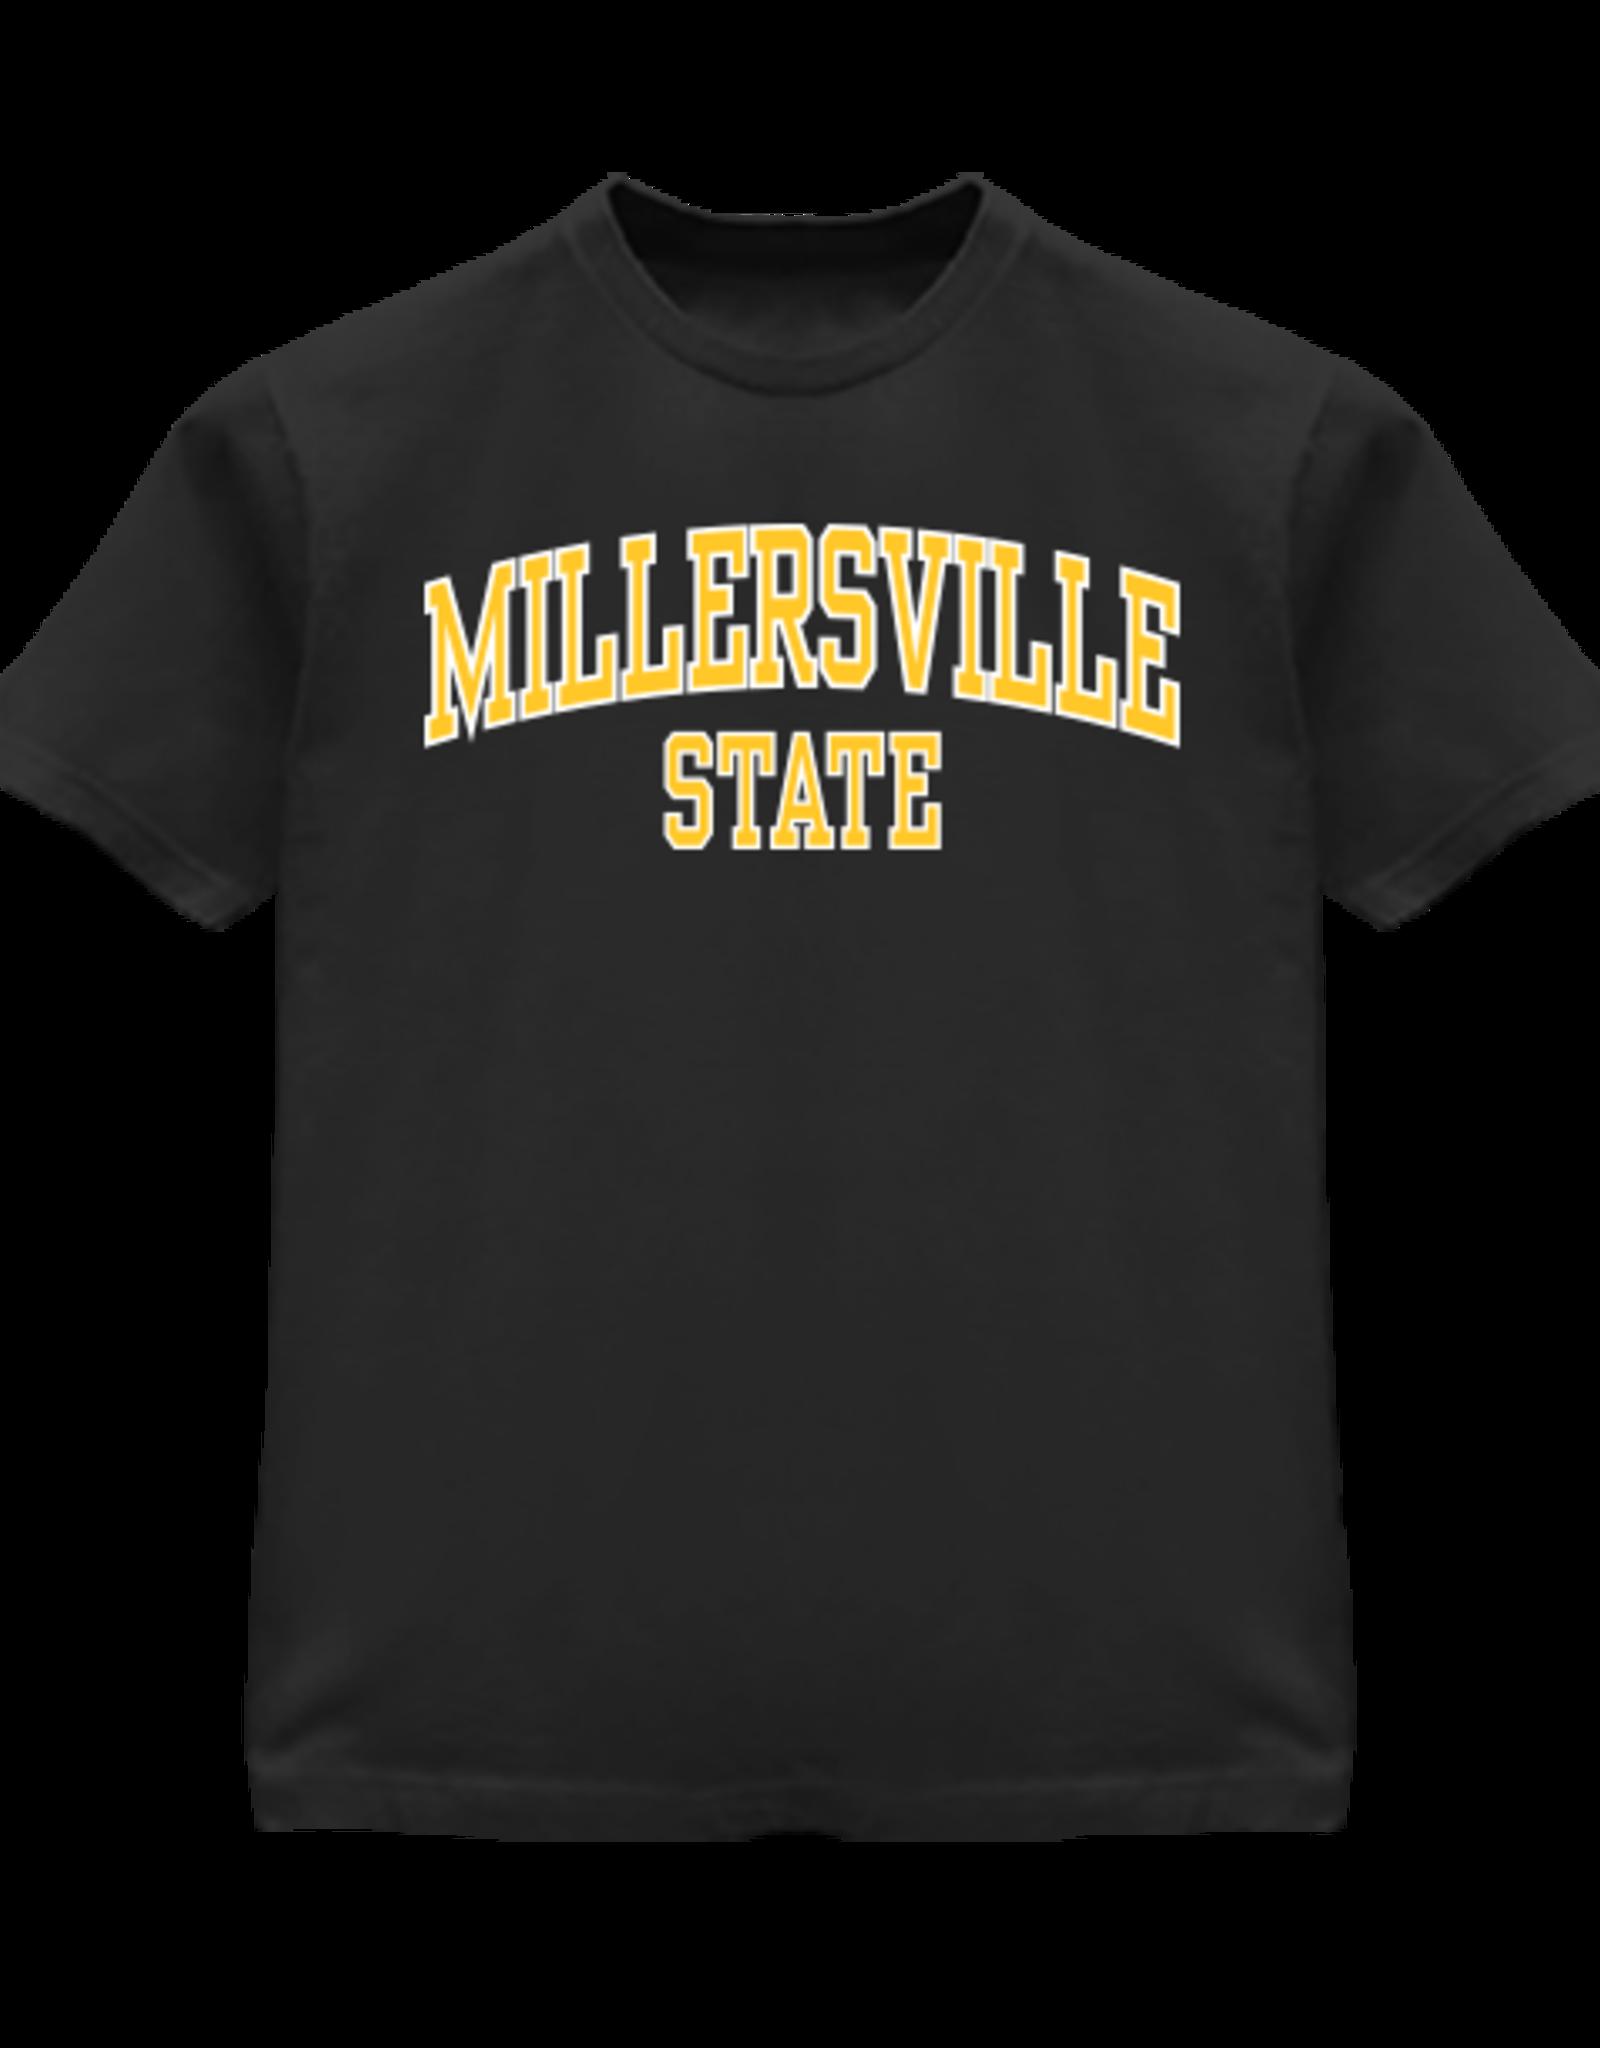 Millersville State Tee